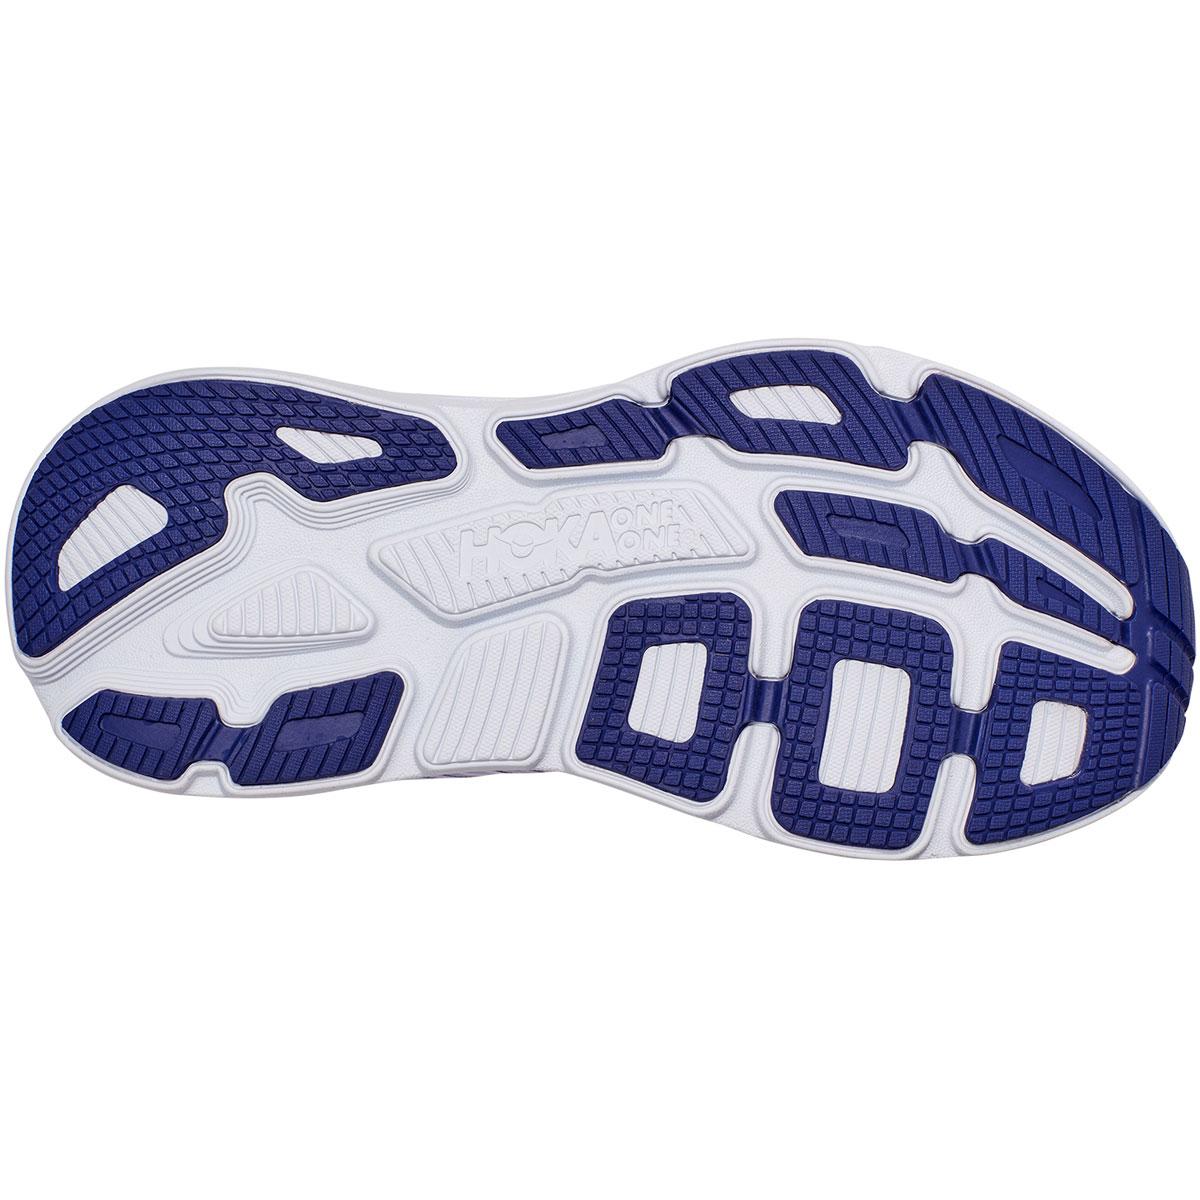 Women's Hoka One One Bondi 7 Running Shoe - Color: Purple Heather/Clematis Blue - Size: 5 - Width: Regular, Purple Heather/Clematis Blue, large, image 3